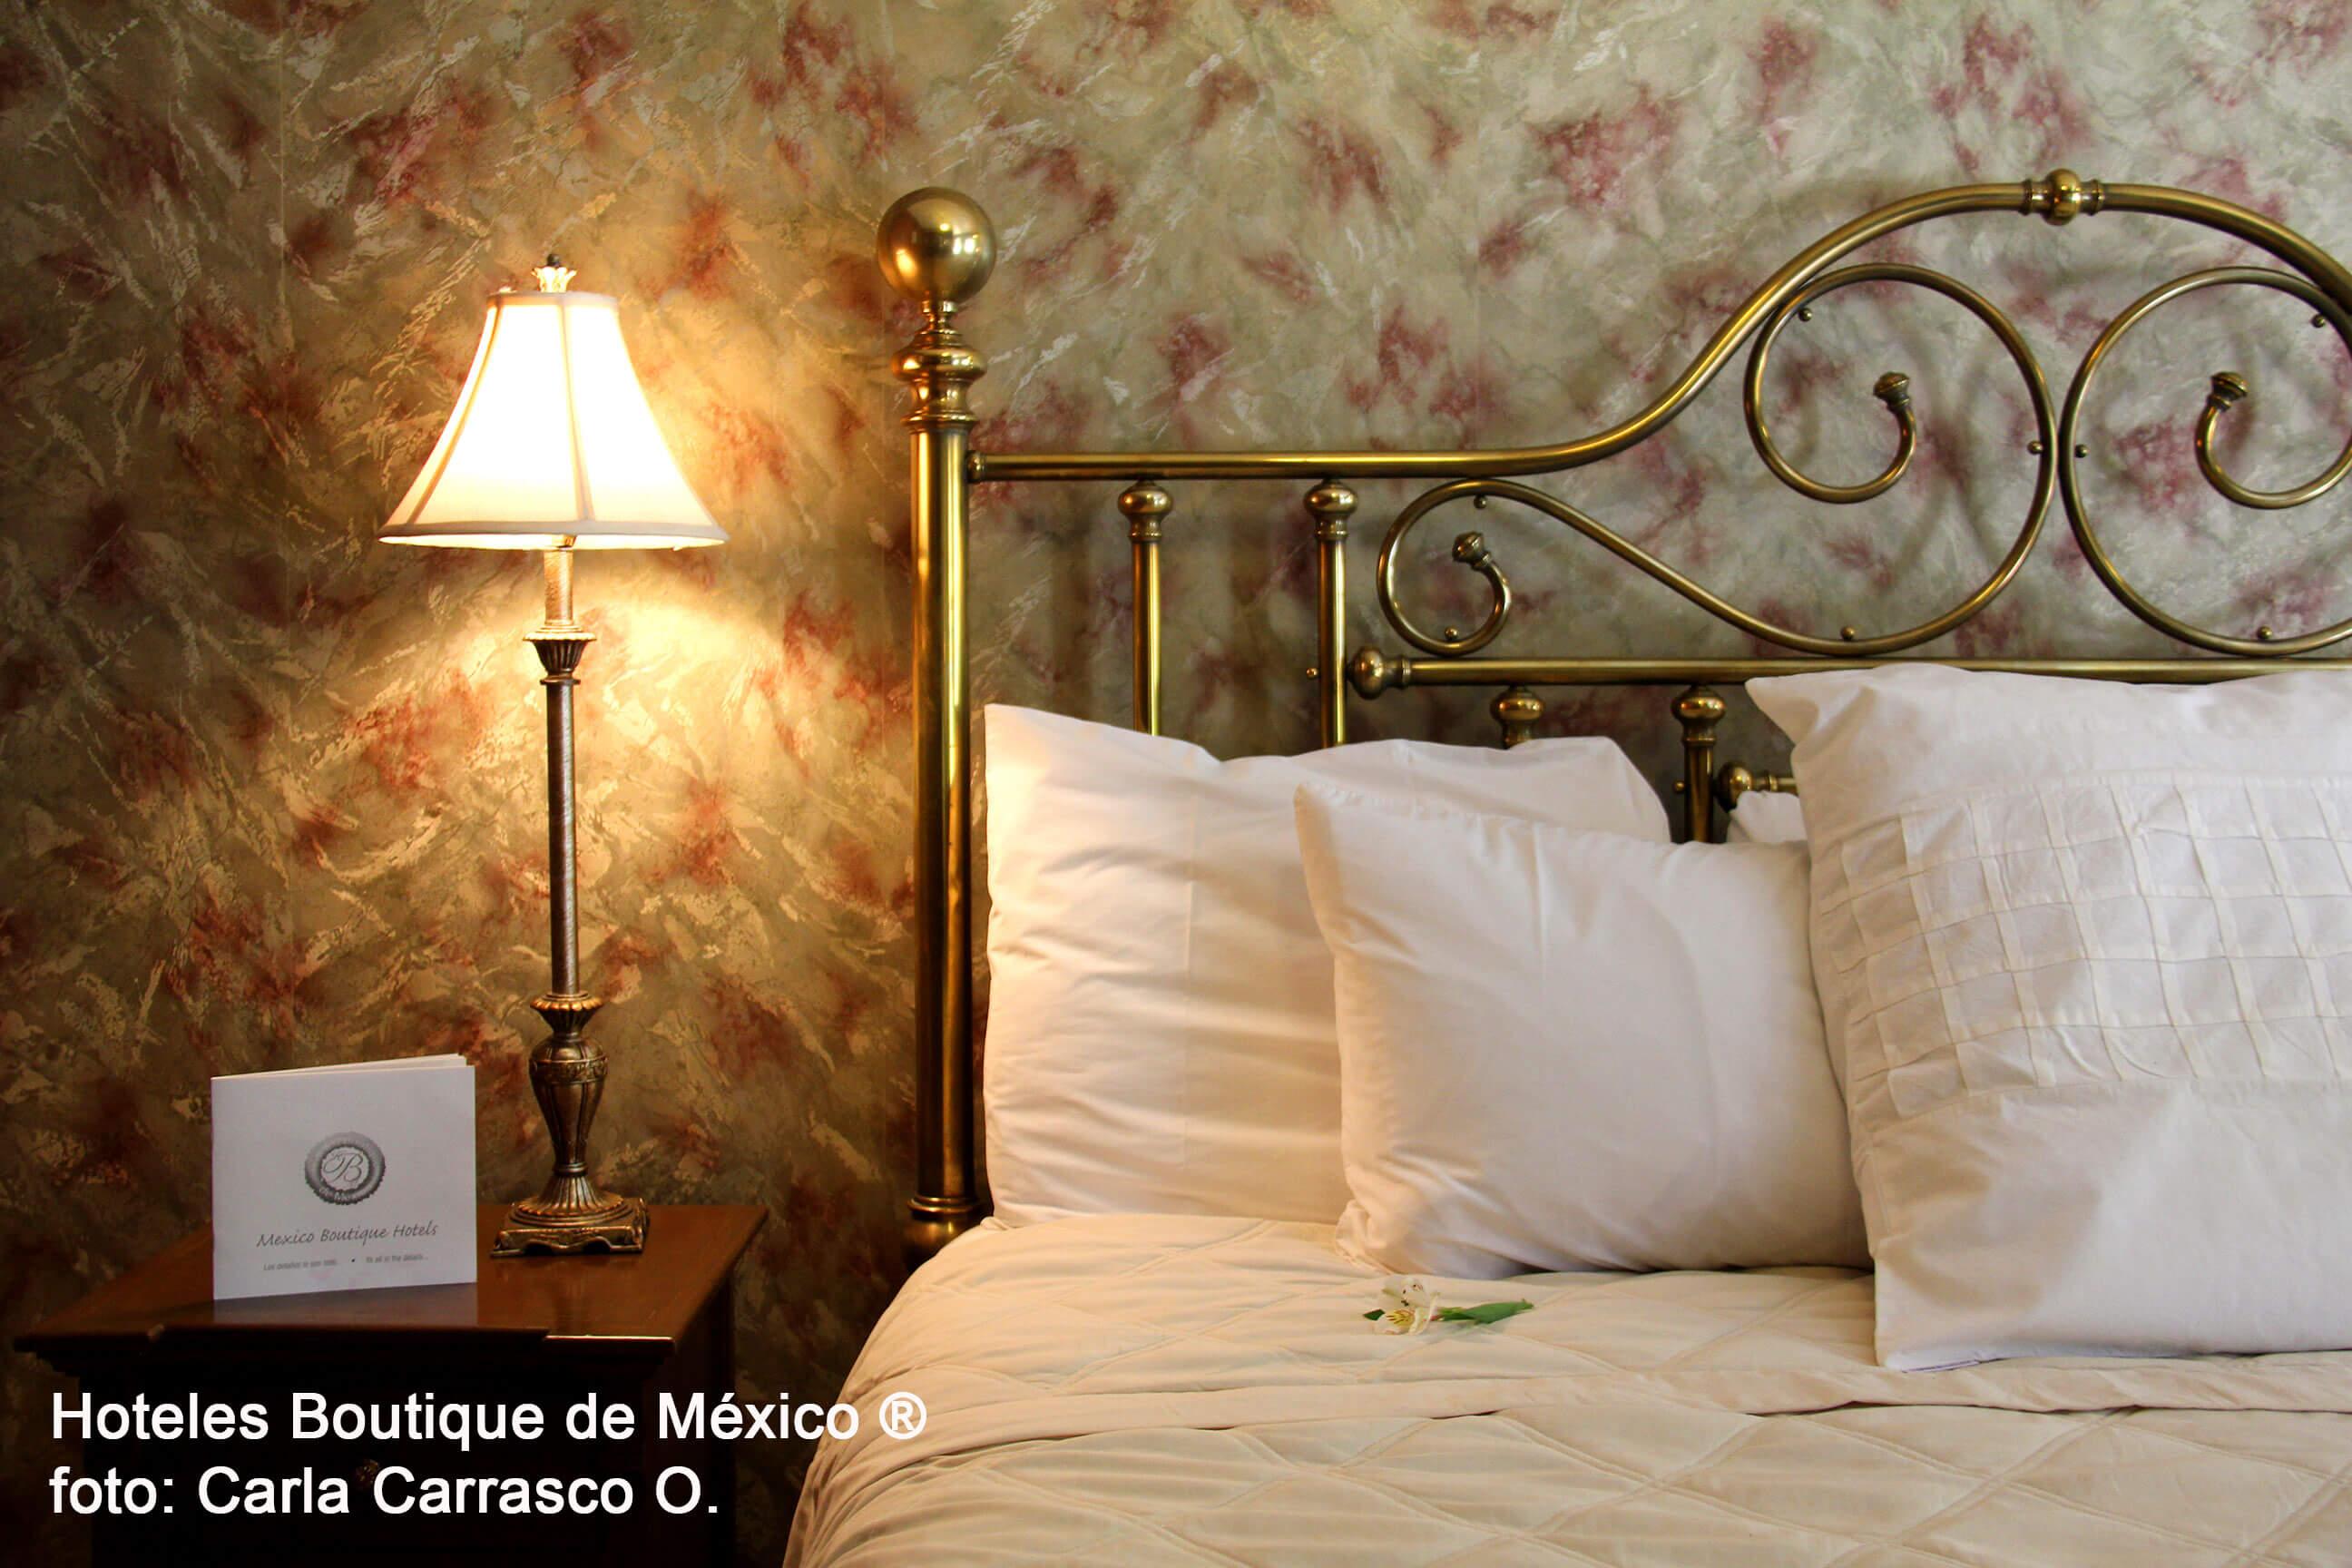 hoteles-boutique-de-mexico-enterate-de-la-locura-al-idealismo-festival-internacional-cervantino-2016-2